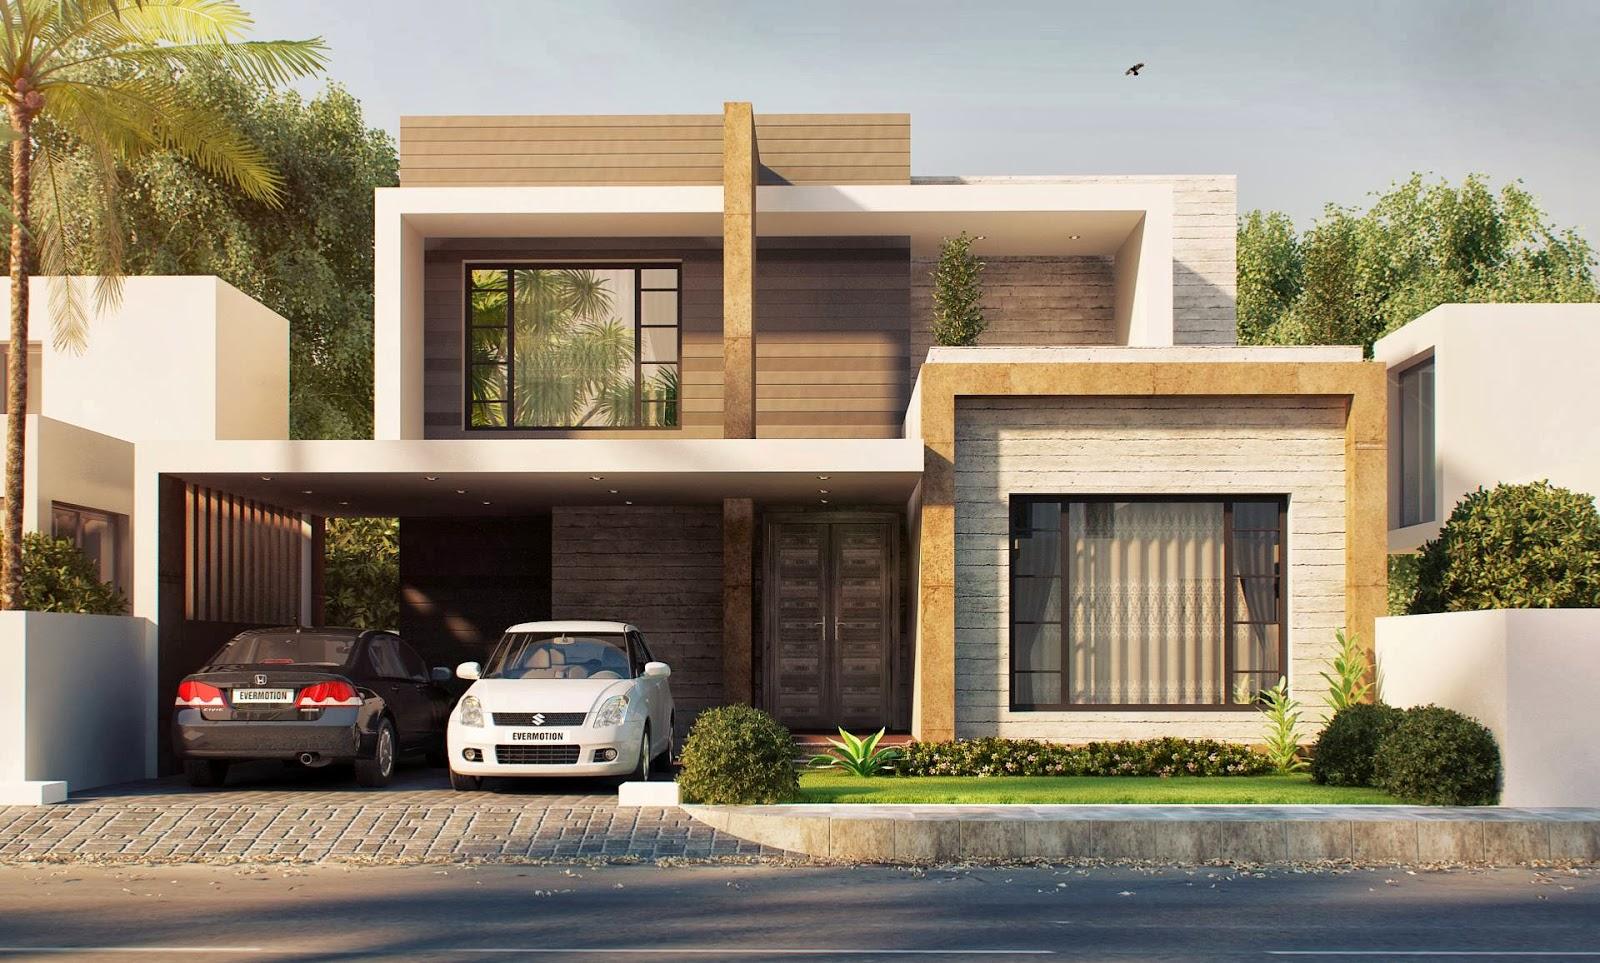 House Plans and Design: Modern Roman Villa House Plans